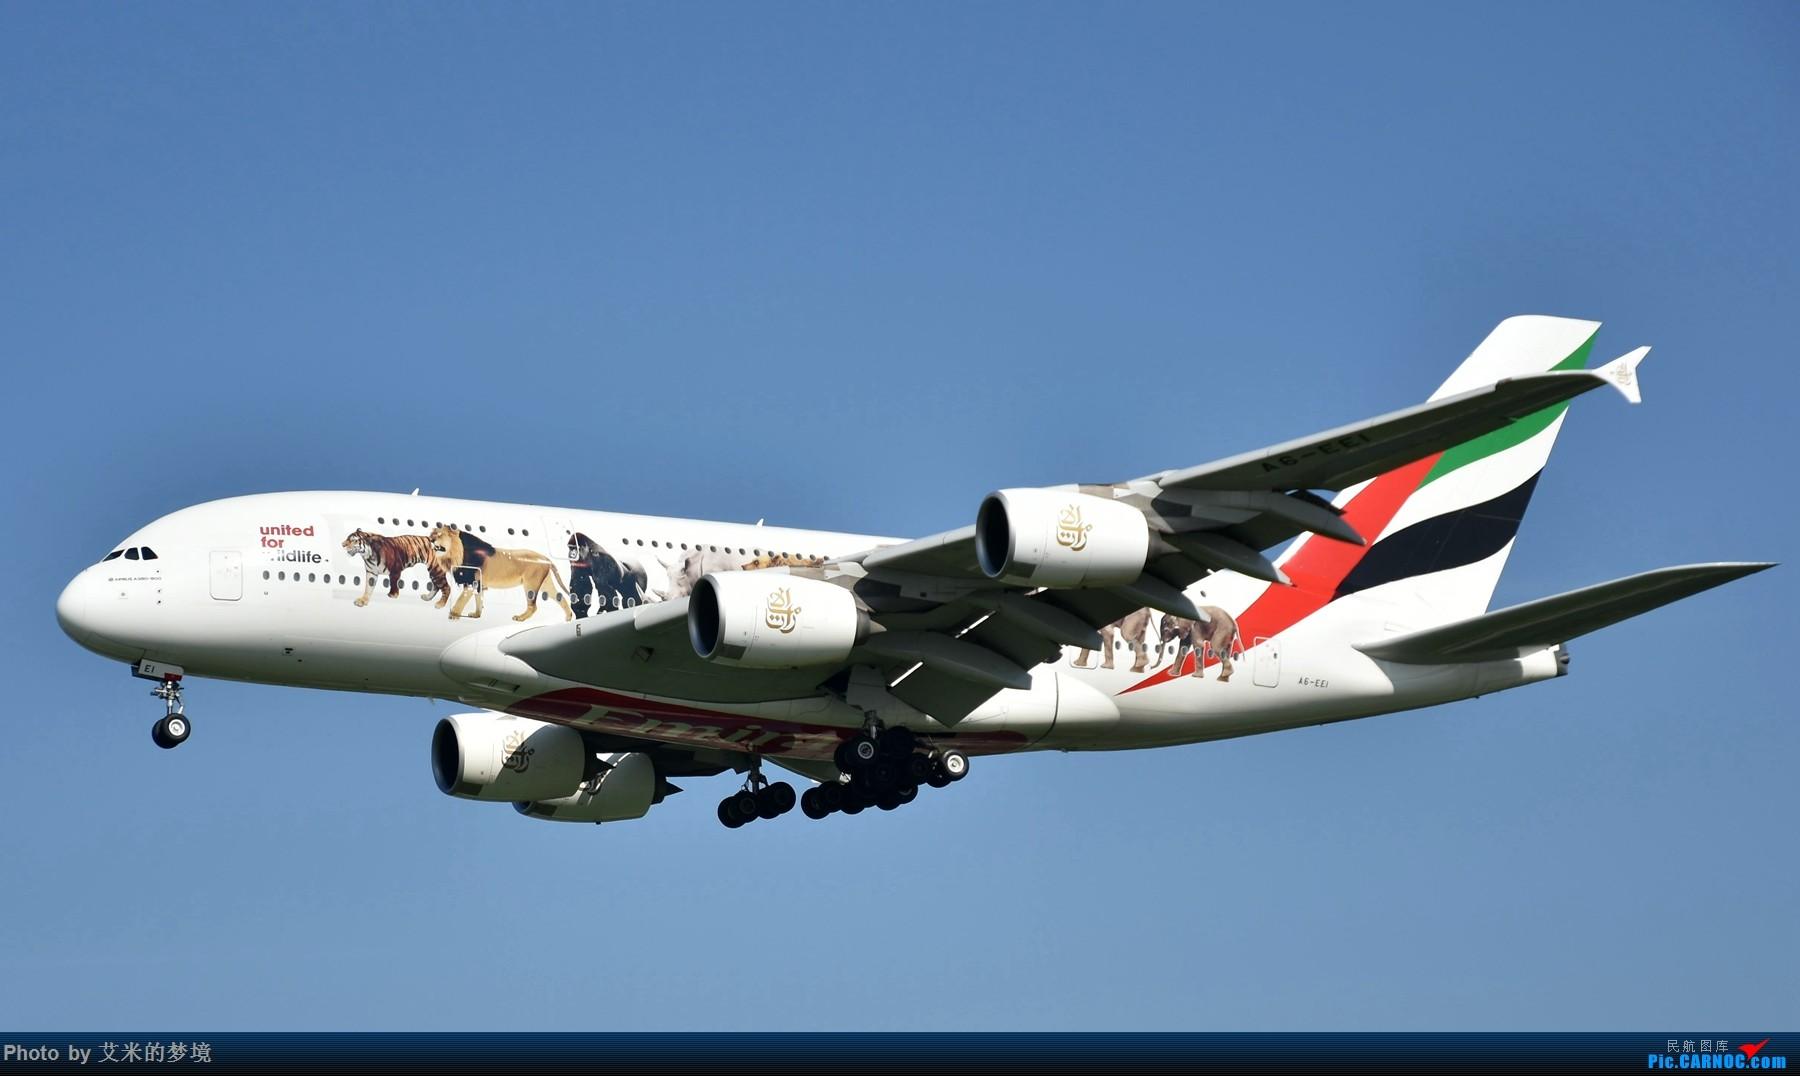 Re:[原创]【carnoc重庆飞友会】北京送行,所见飞行 AIRBUS A380-800 A6-EEI 中国北京首都国际机场